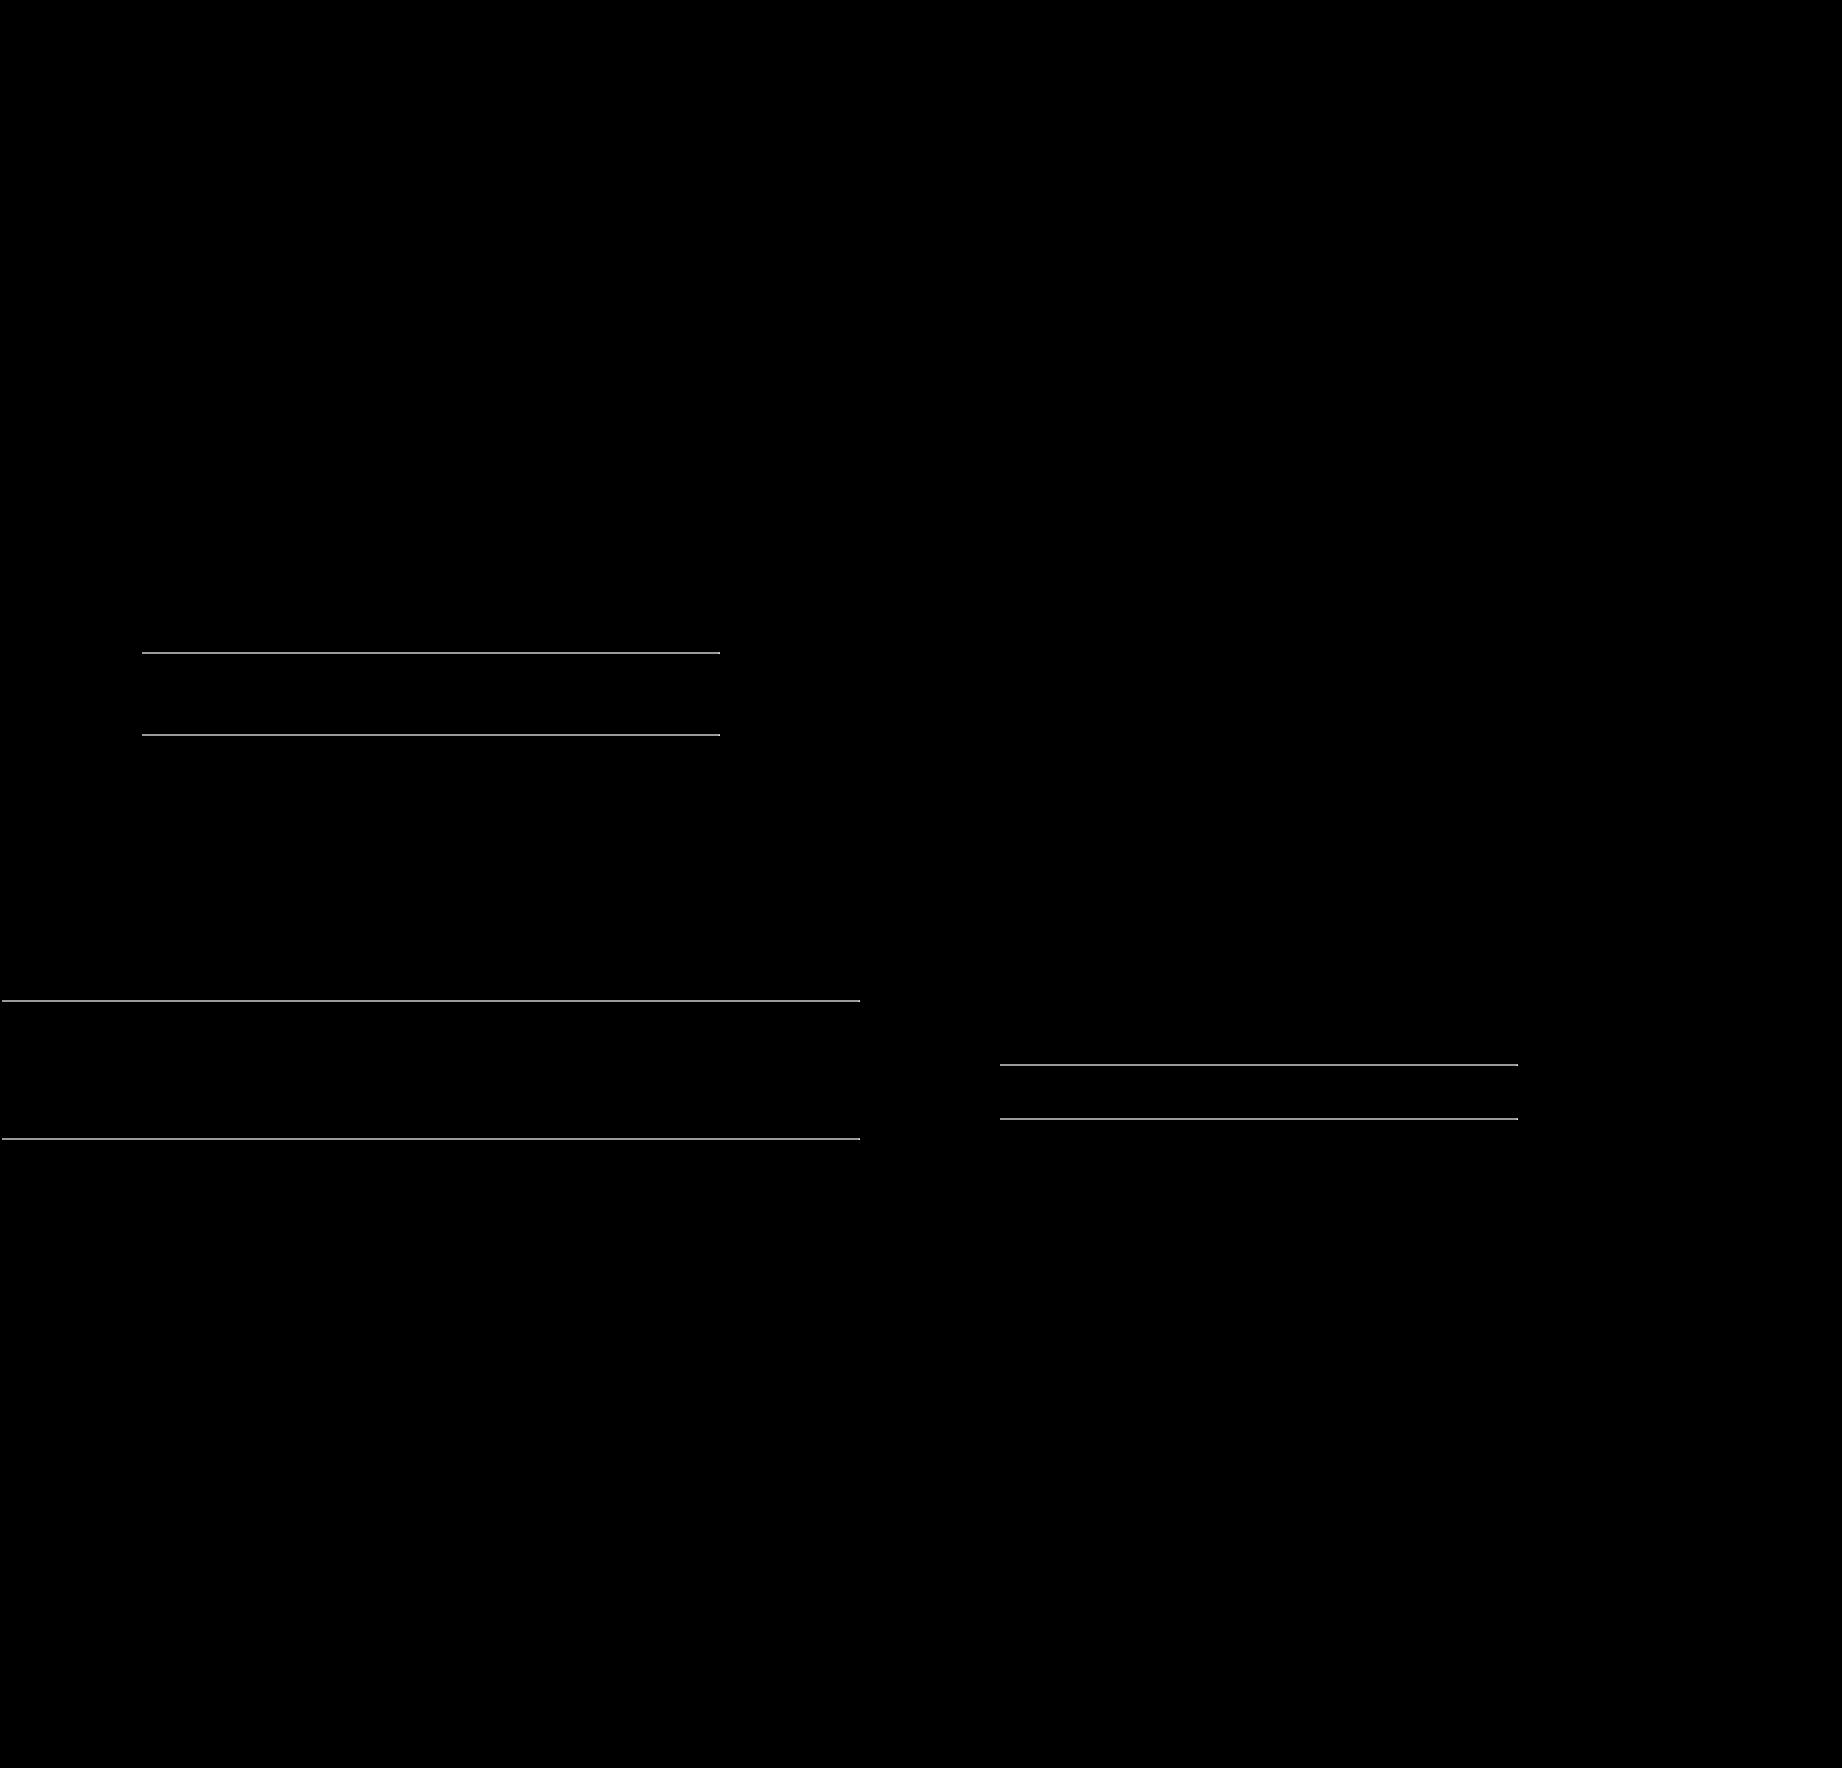 ROS Node Configuration - nlamprian